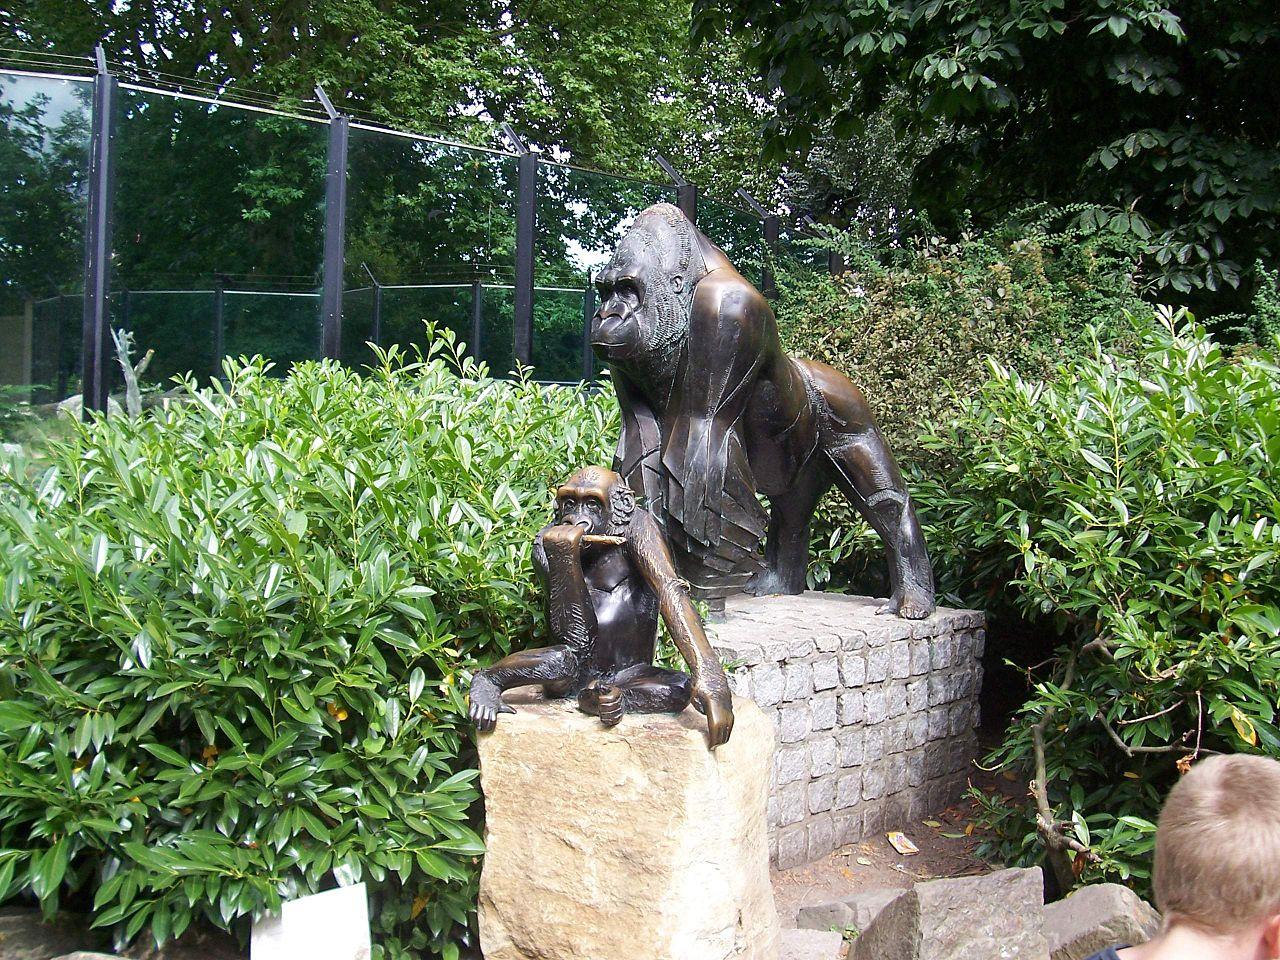 Зоопарк в Амстердаме, скульптурная композиция